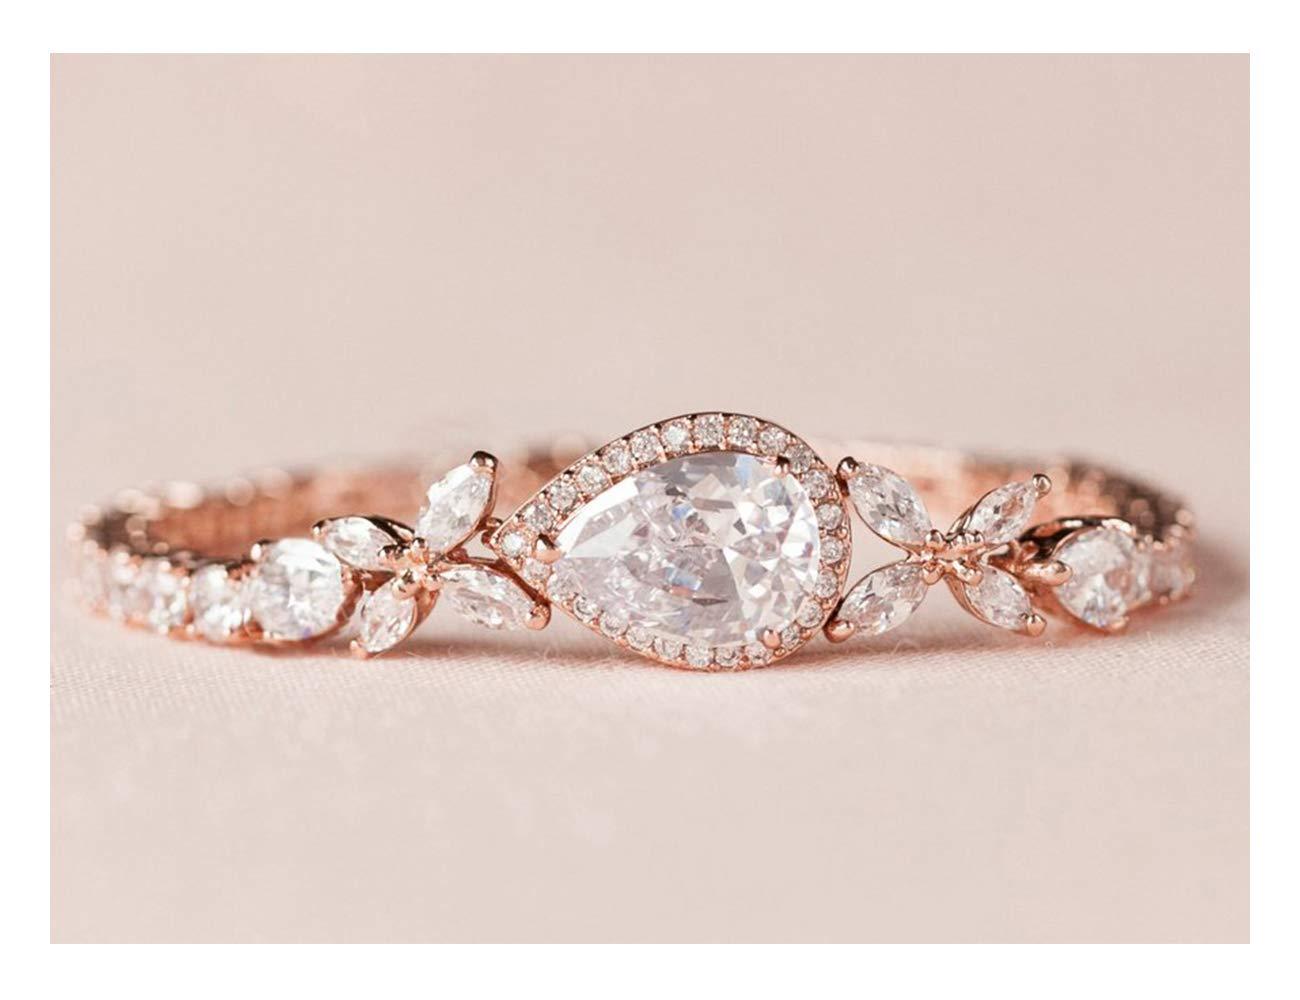 SWEETV Cubic Zirconia Teardrop Bracelets for Wedding Bridal Jewelry, Crystal Rhinestone Tennis Bracelets for Brides,Bridesmaid,Women,Rose Gold